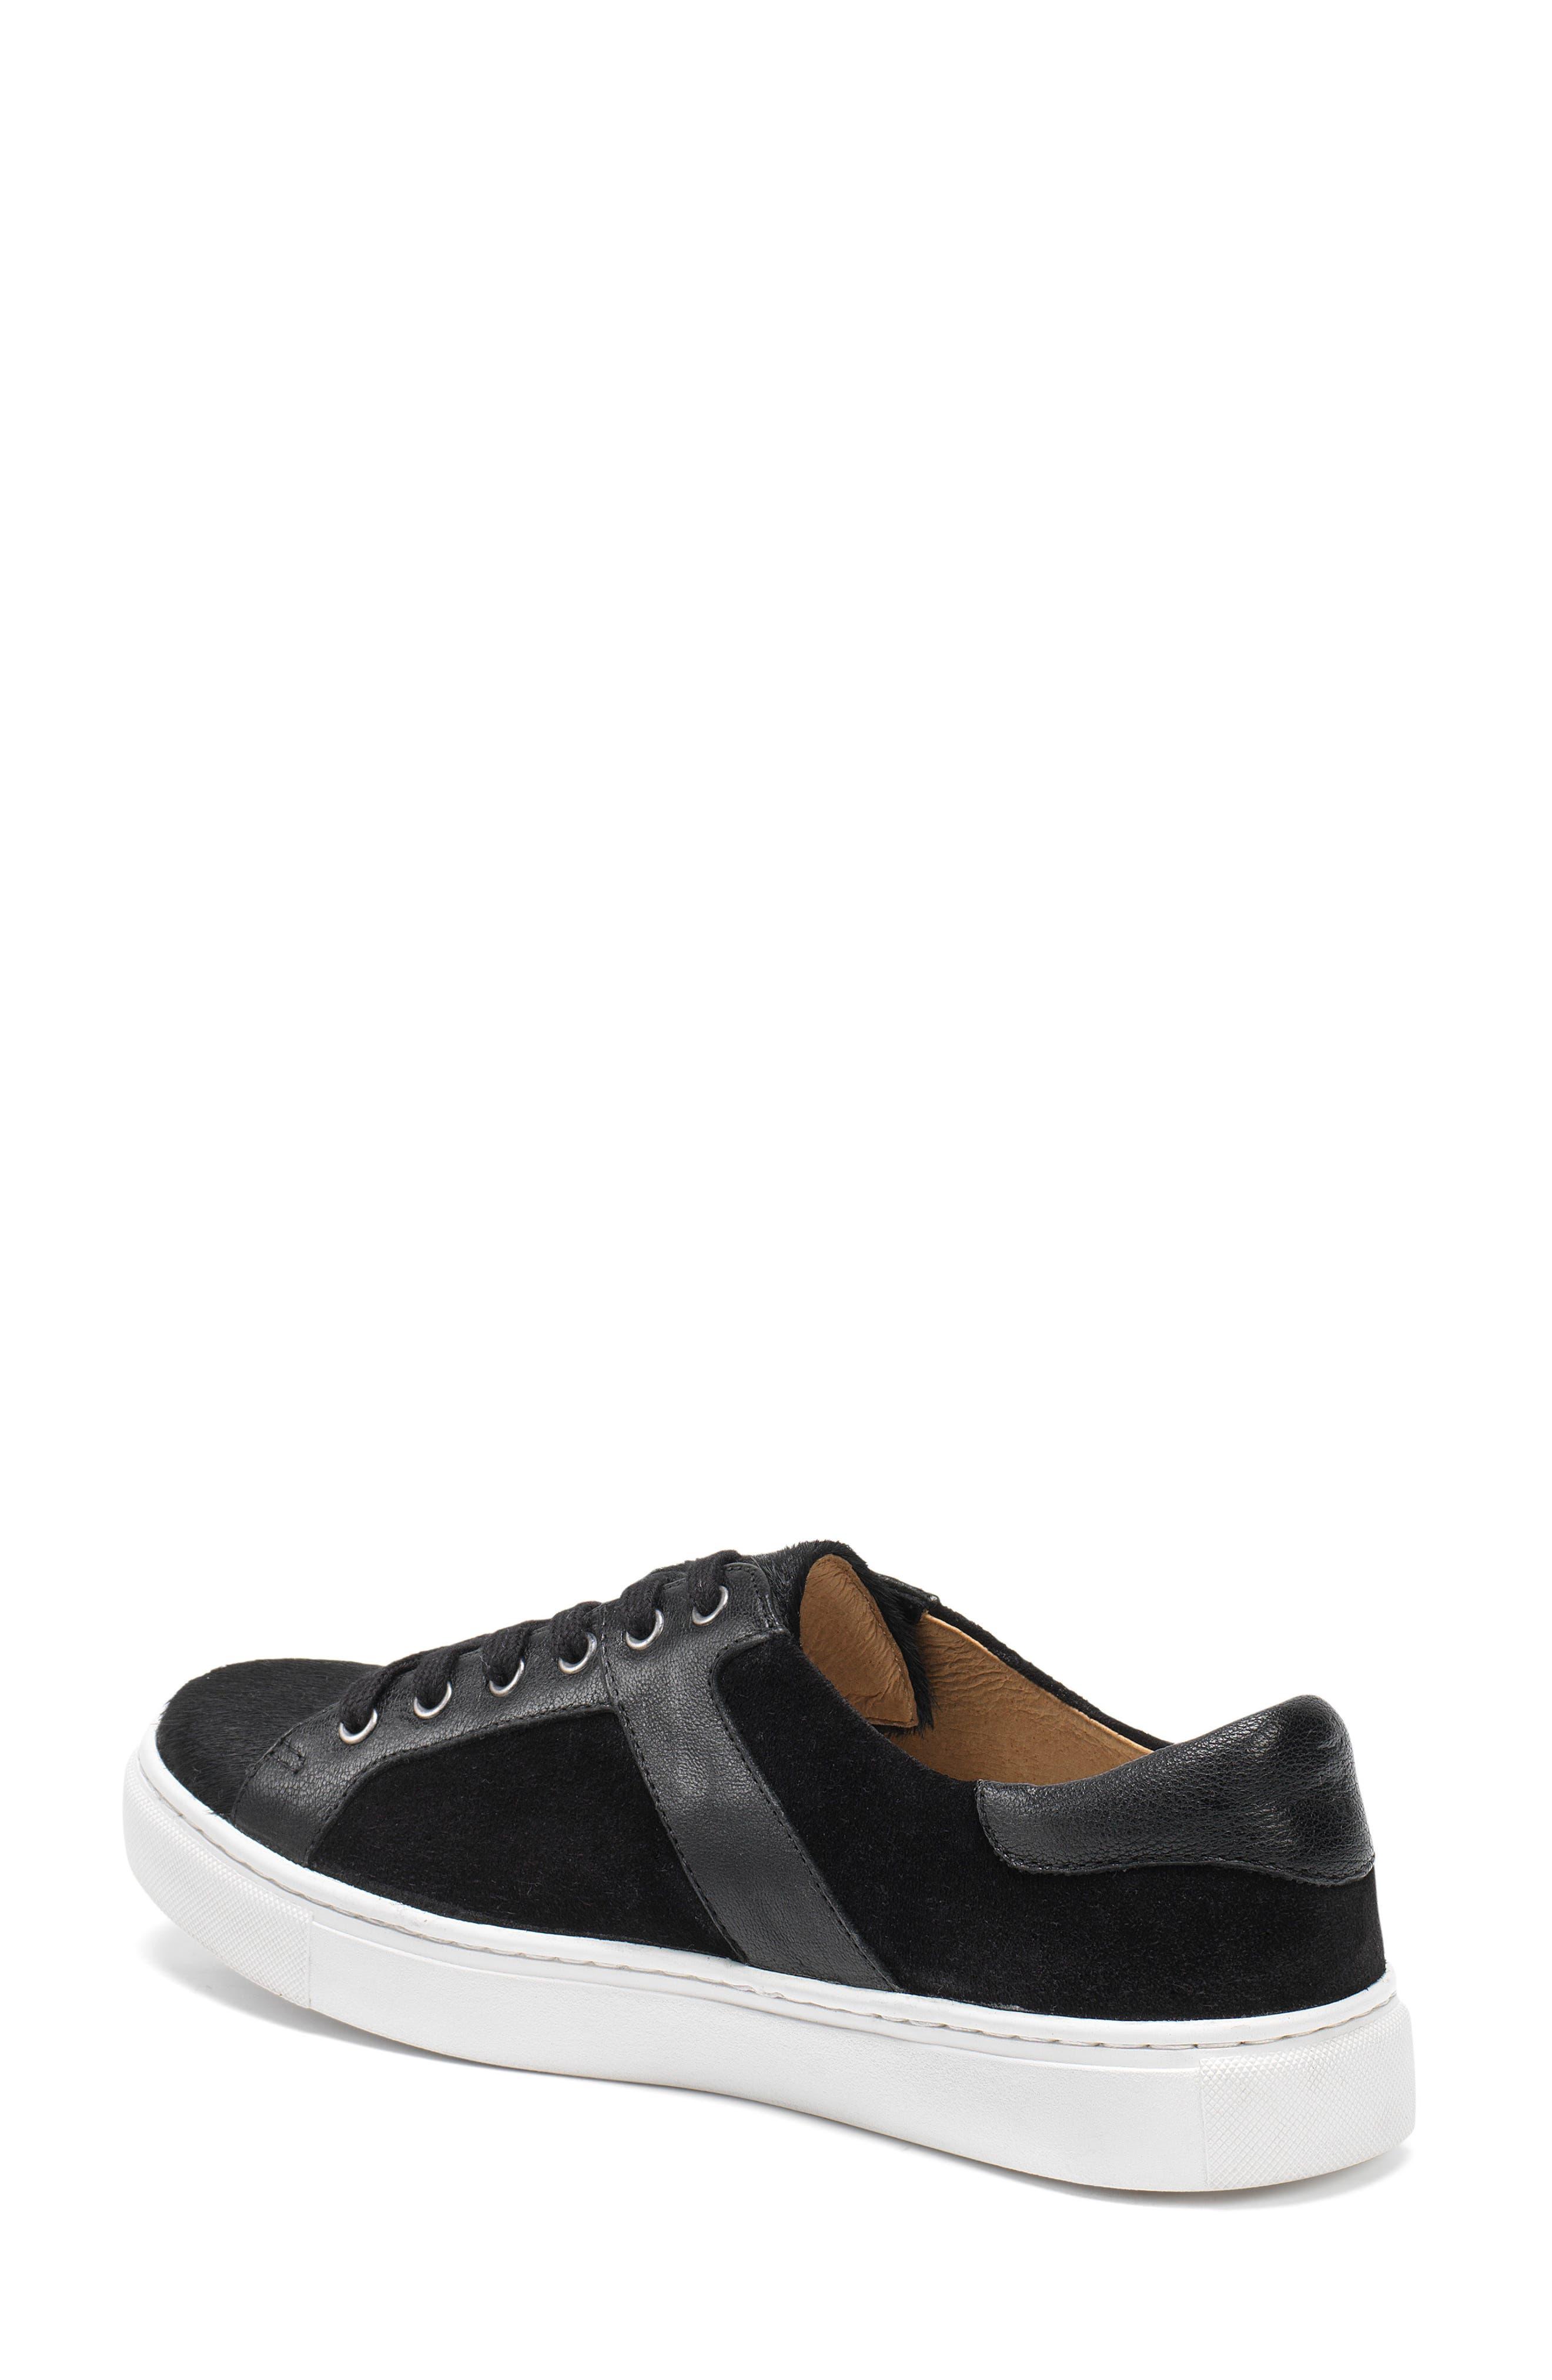 Lindsey Genuine Calf Hair Sneaker,                             Alternate thumbnail 2, color,                             Black Calfhair